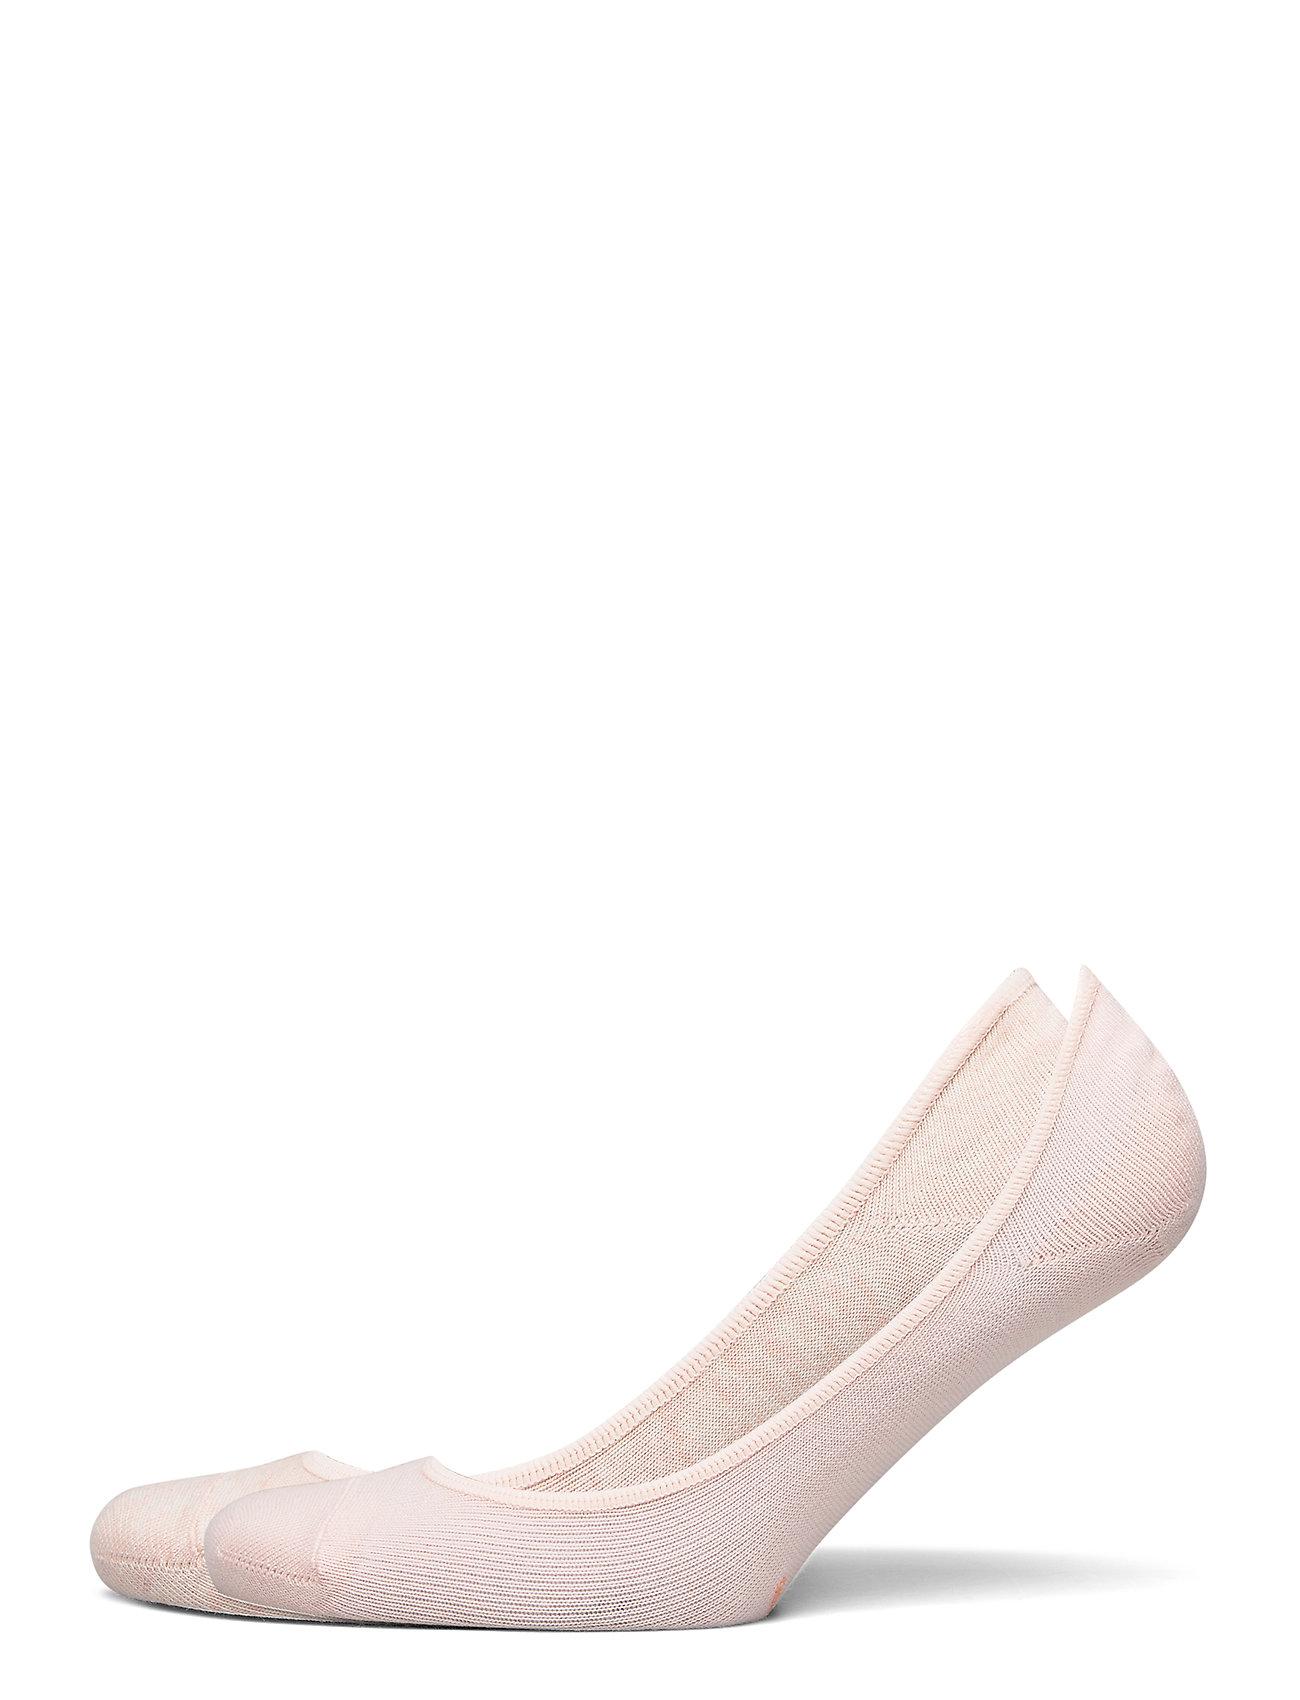 Image of Puma Women Footie 2p Lingerie Socks Footies/Ankle Socks Lyserød PUMA (3416363411)